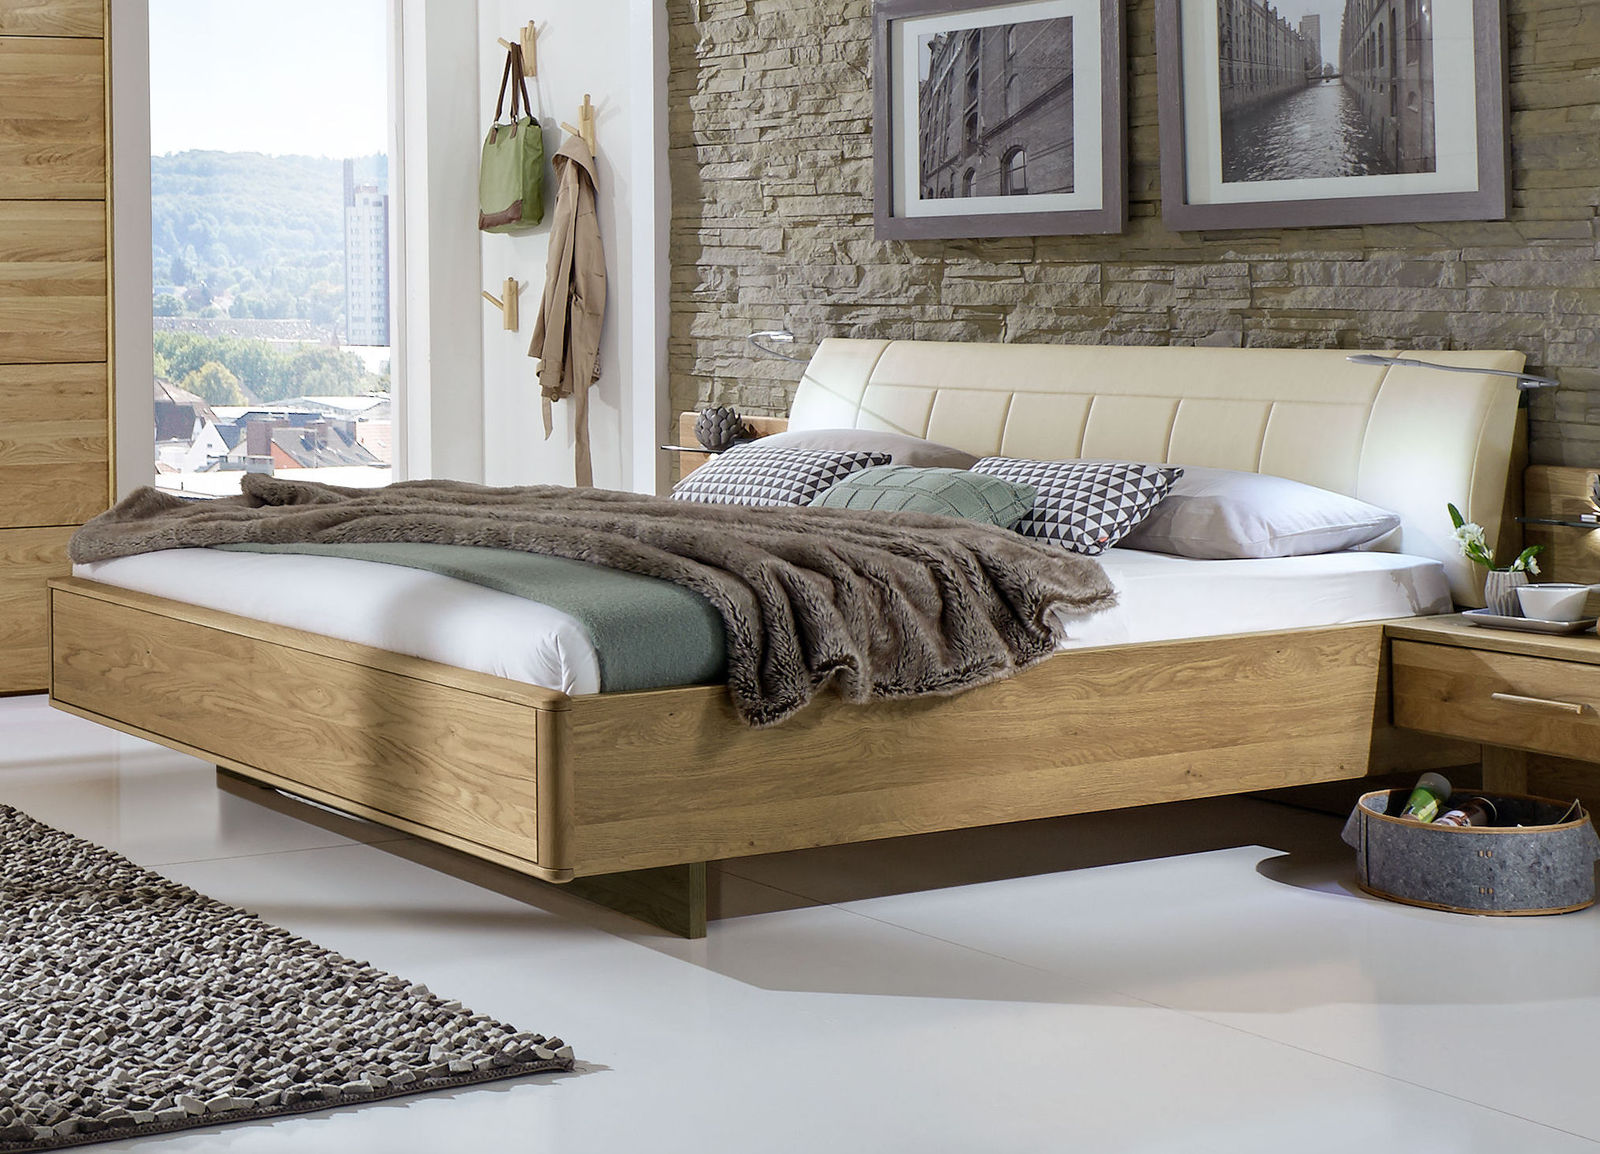 doppelbett schwebend mit gepolstertem kunstleder kopfteil temir. Black Bedroom Furniture Sets. Home Design Ideas